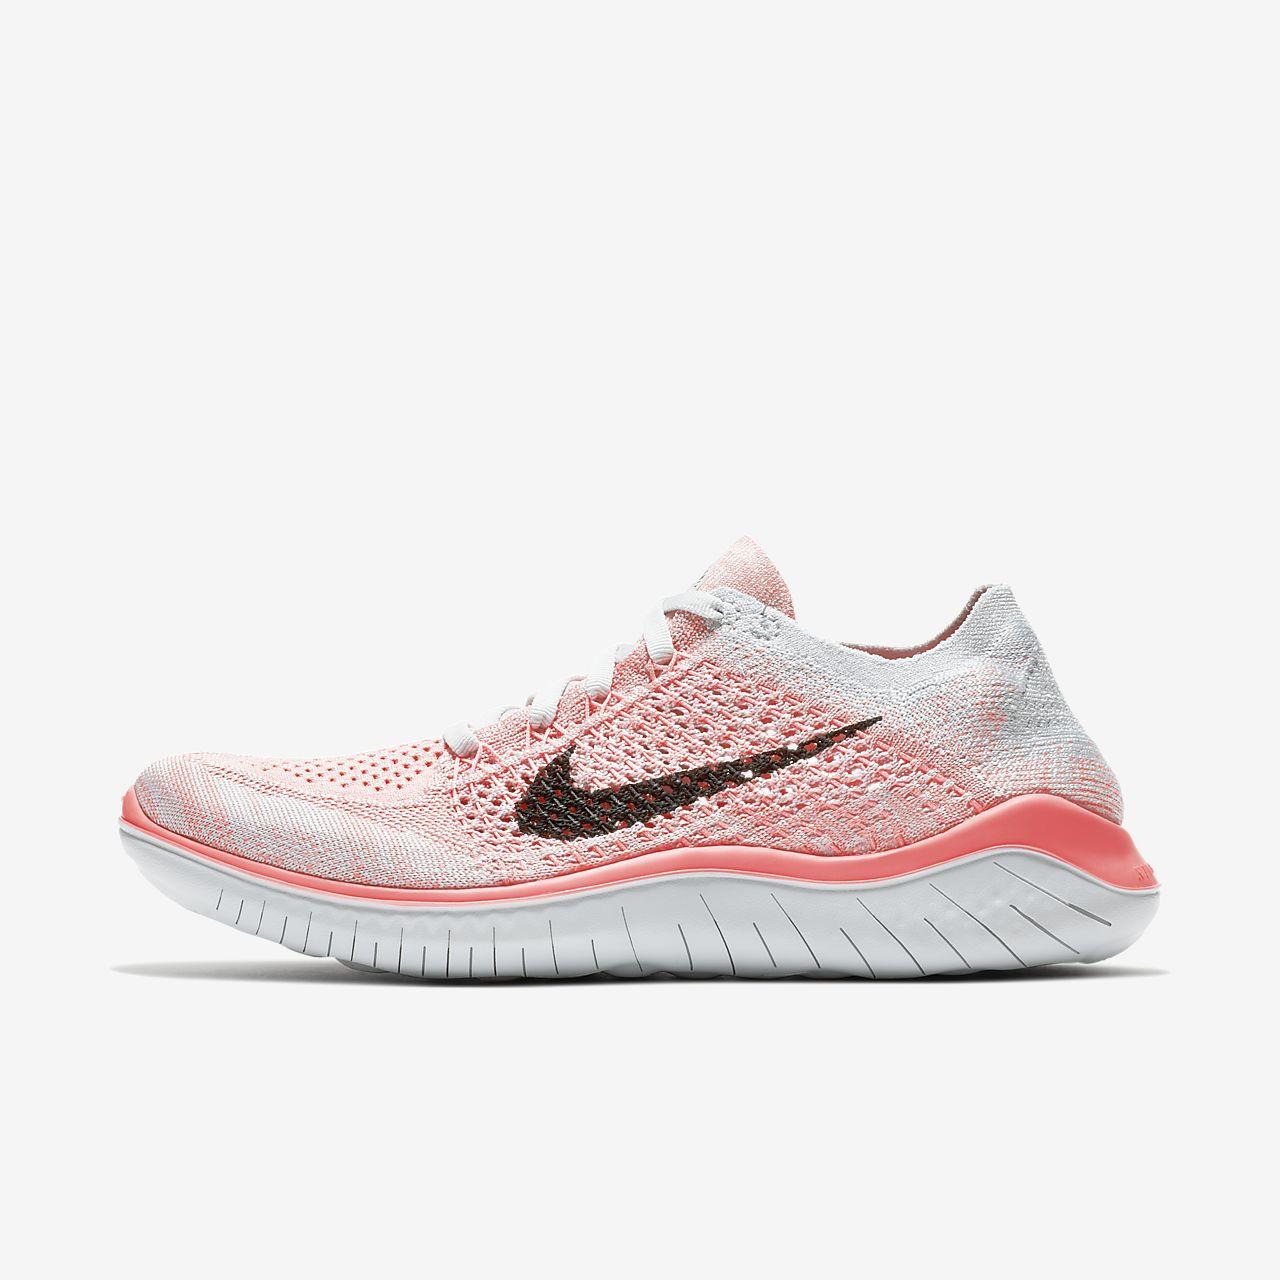 Nike Libre Rn Flyknit 2018 Womens Ouvert Britannique